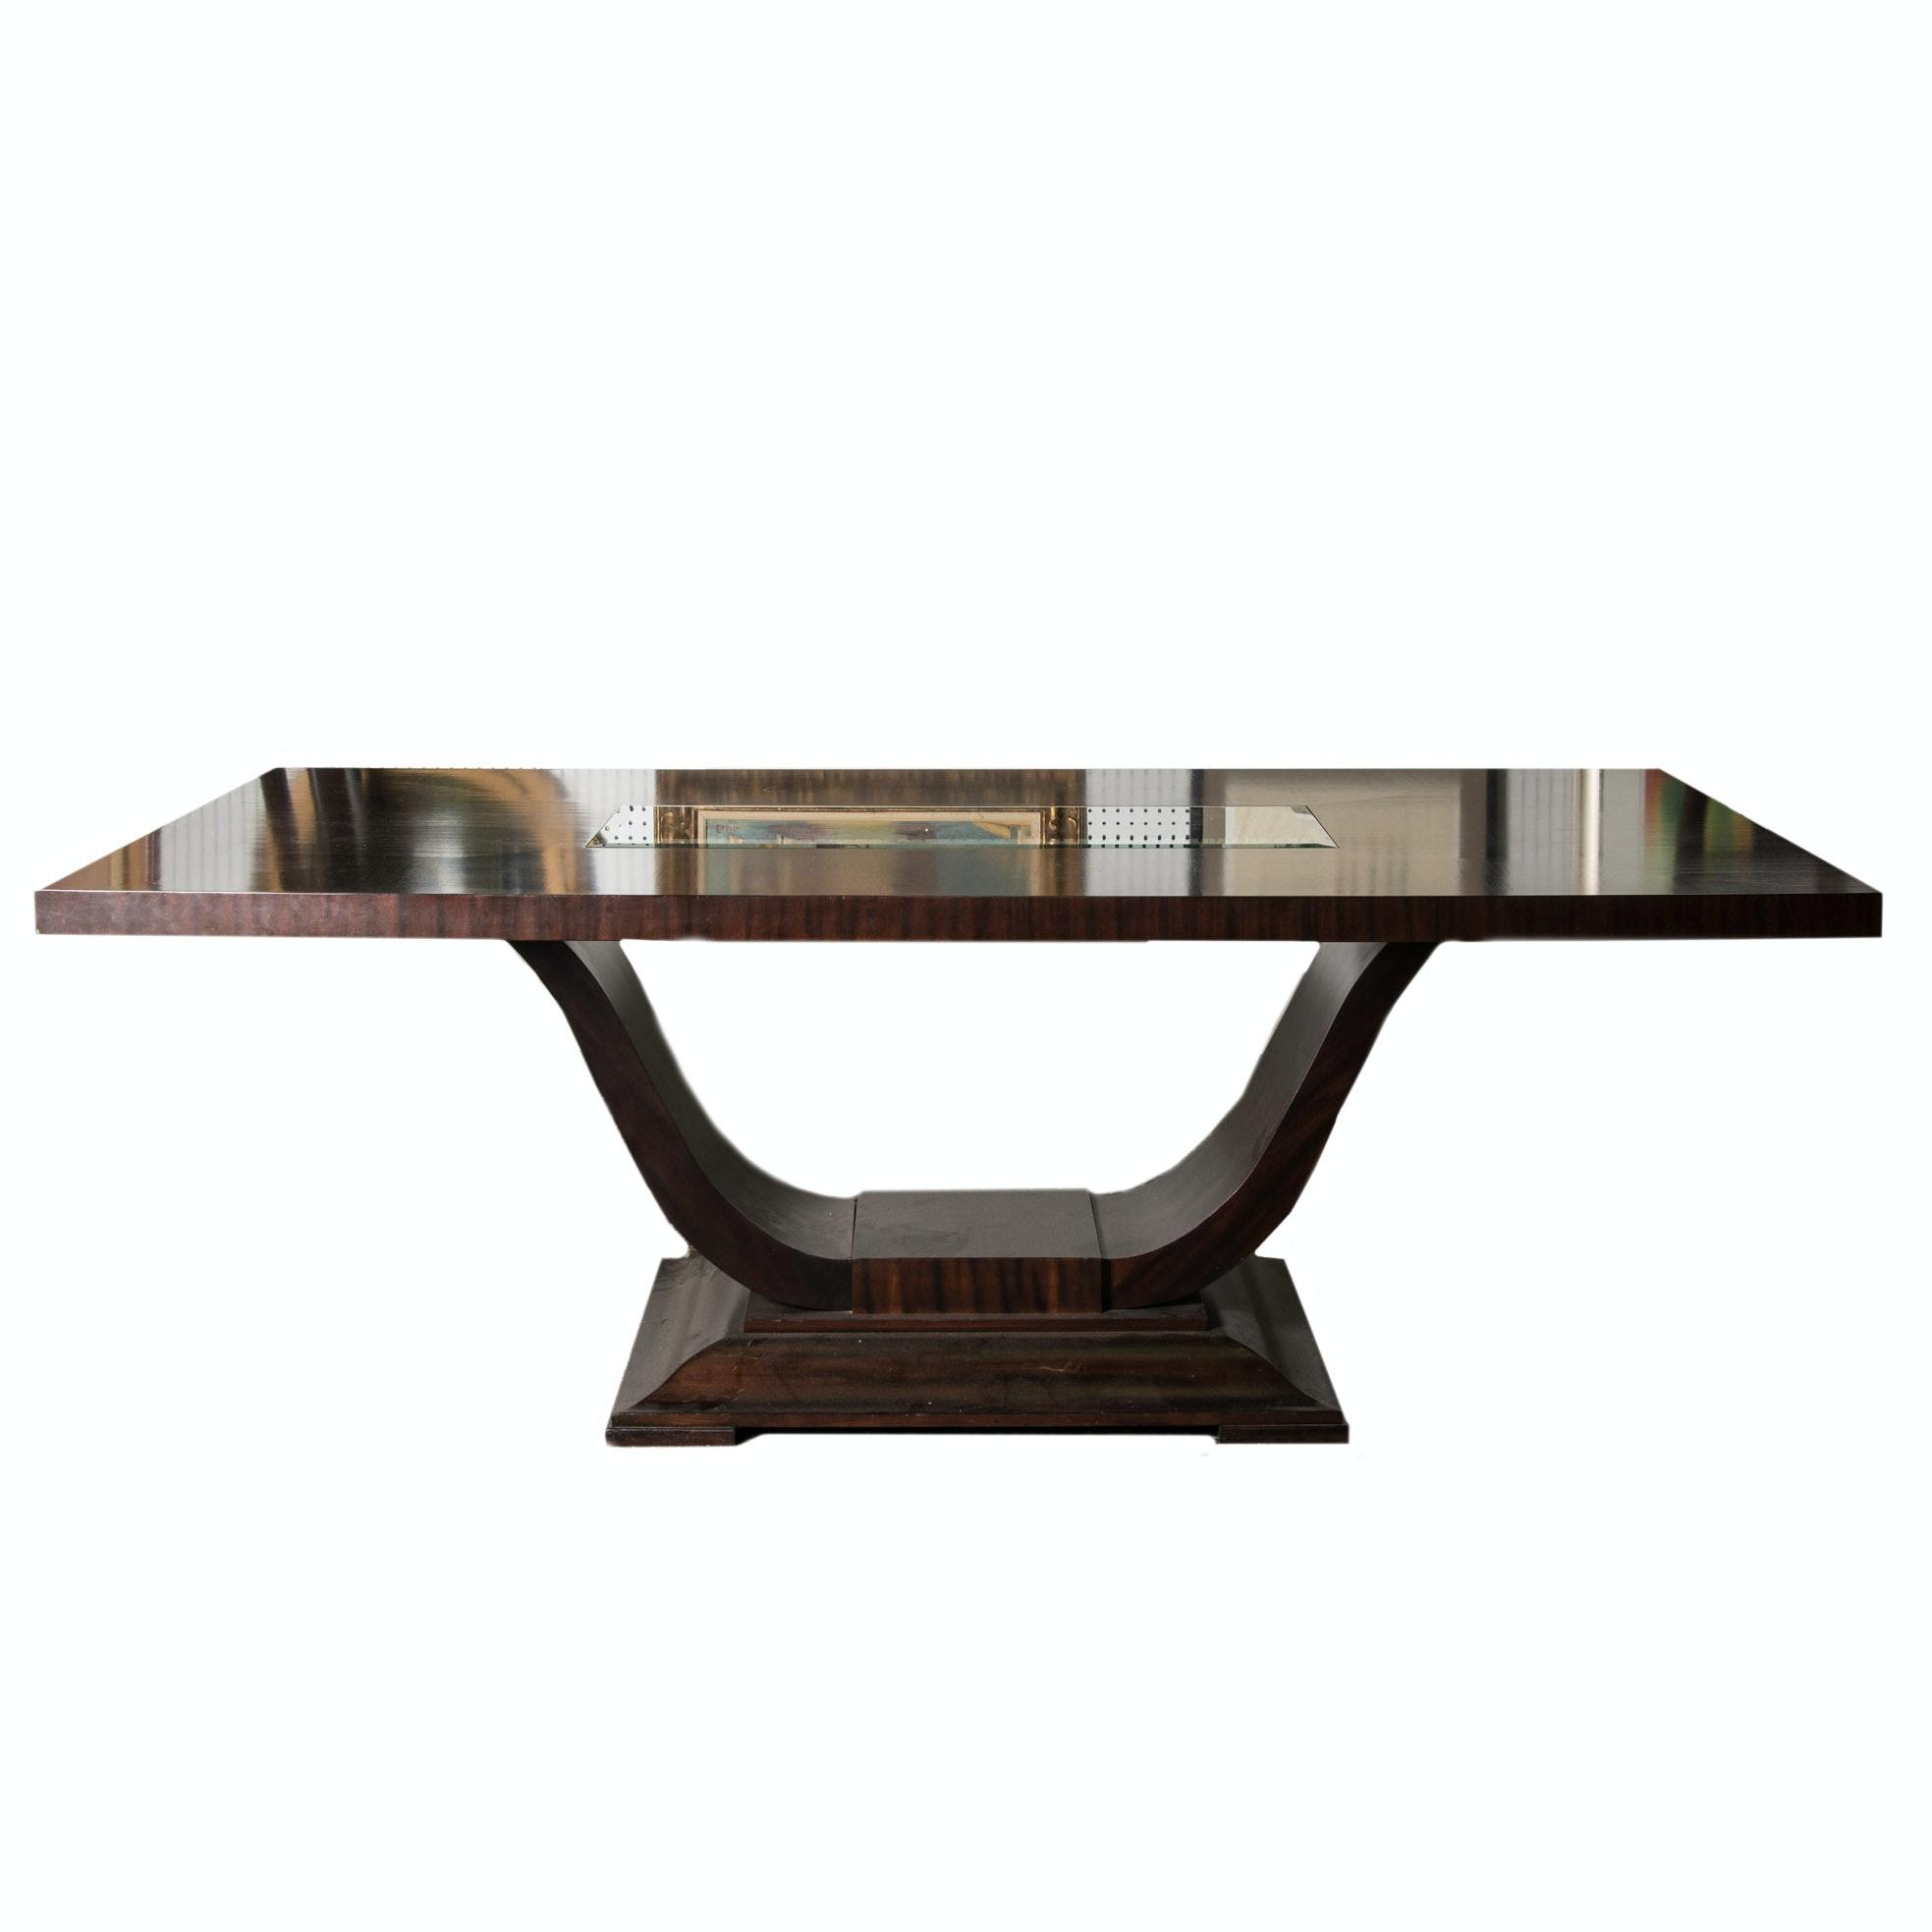 Modern Mahogany Dining Table EBTH : VIK2716jpgixlibrb 11 from www.ebth.com size 880 x 906 jpeg 42kB